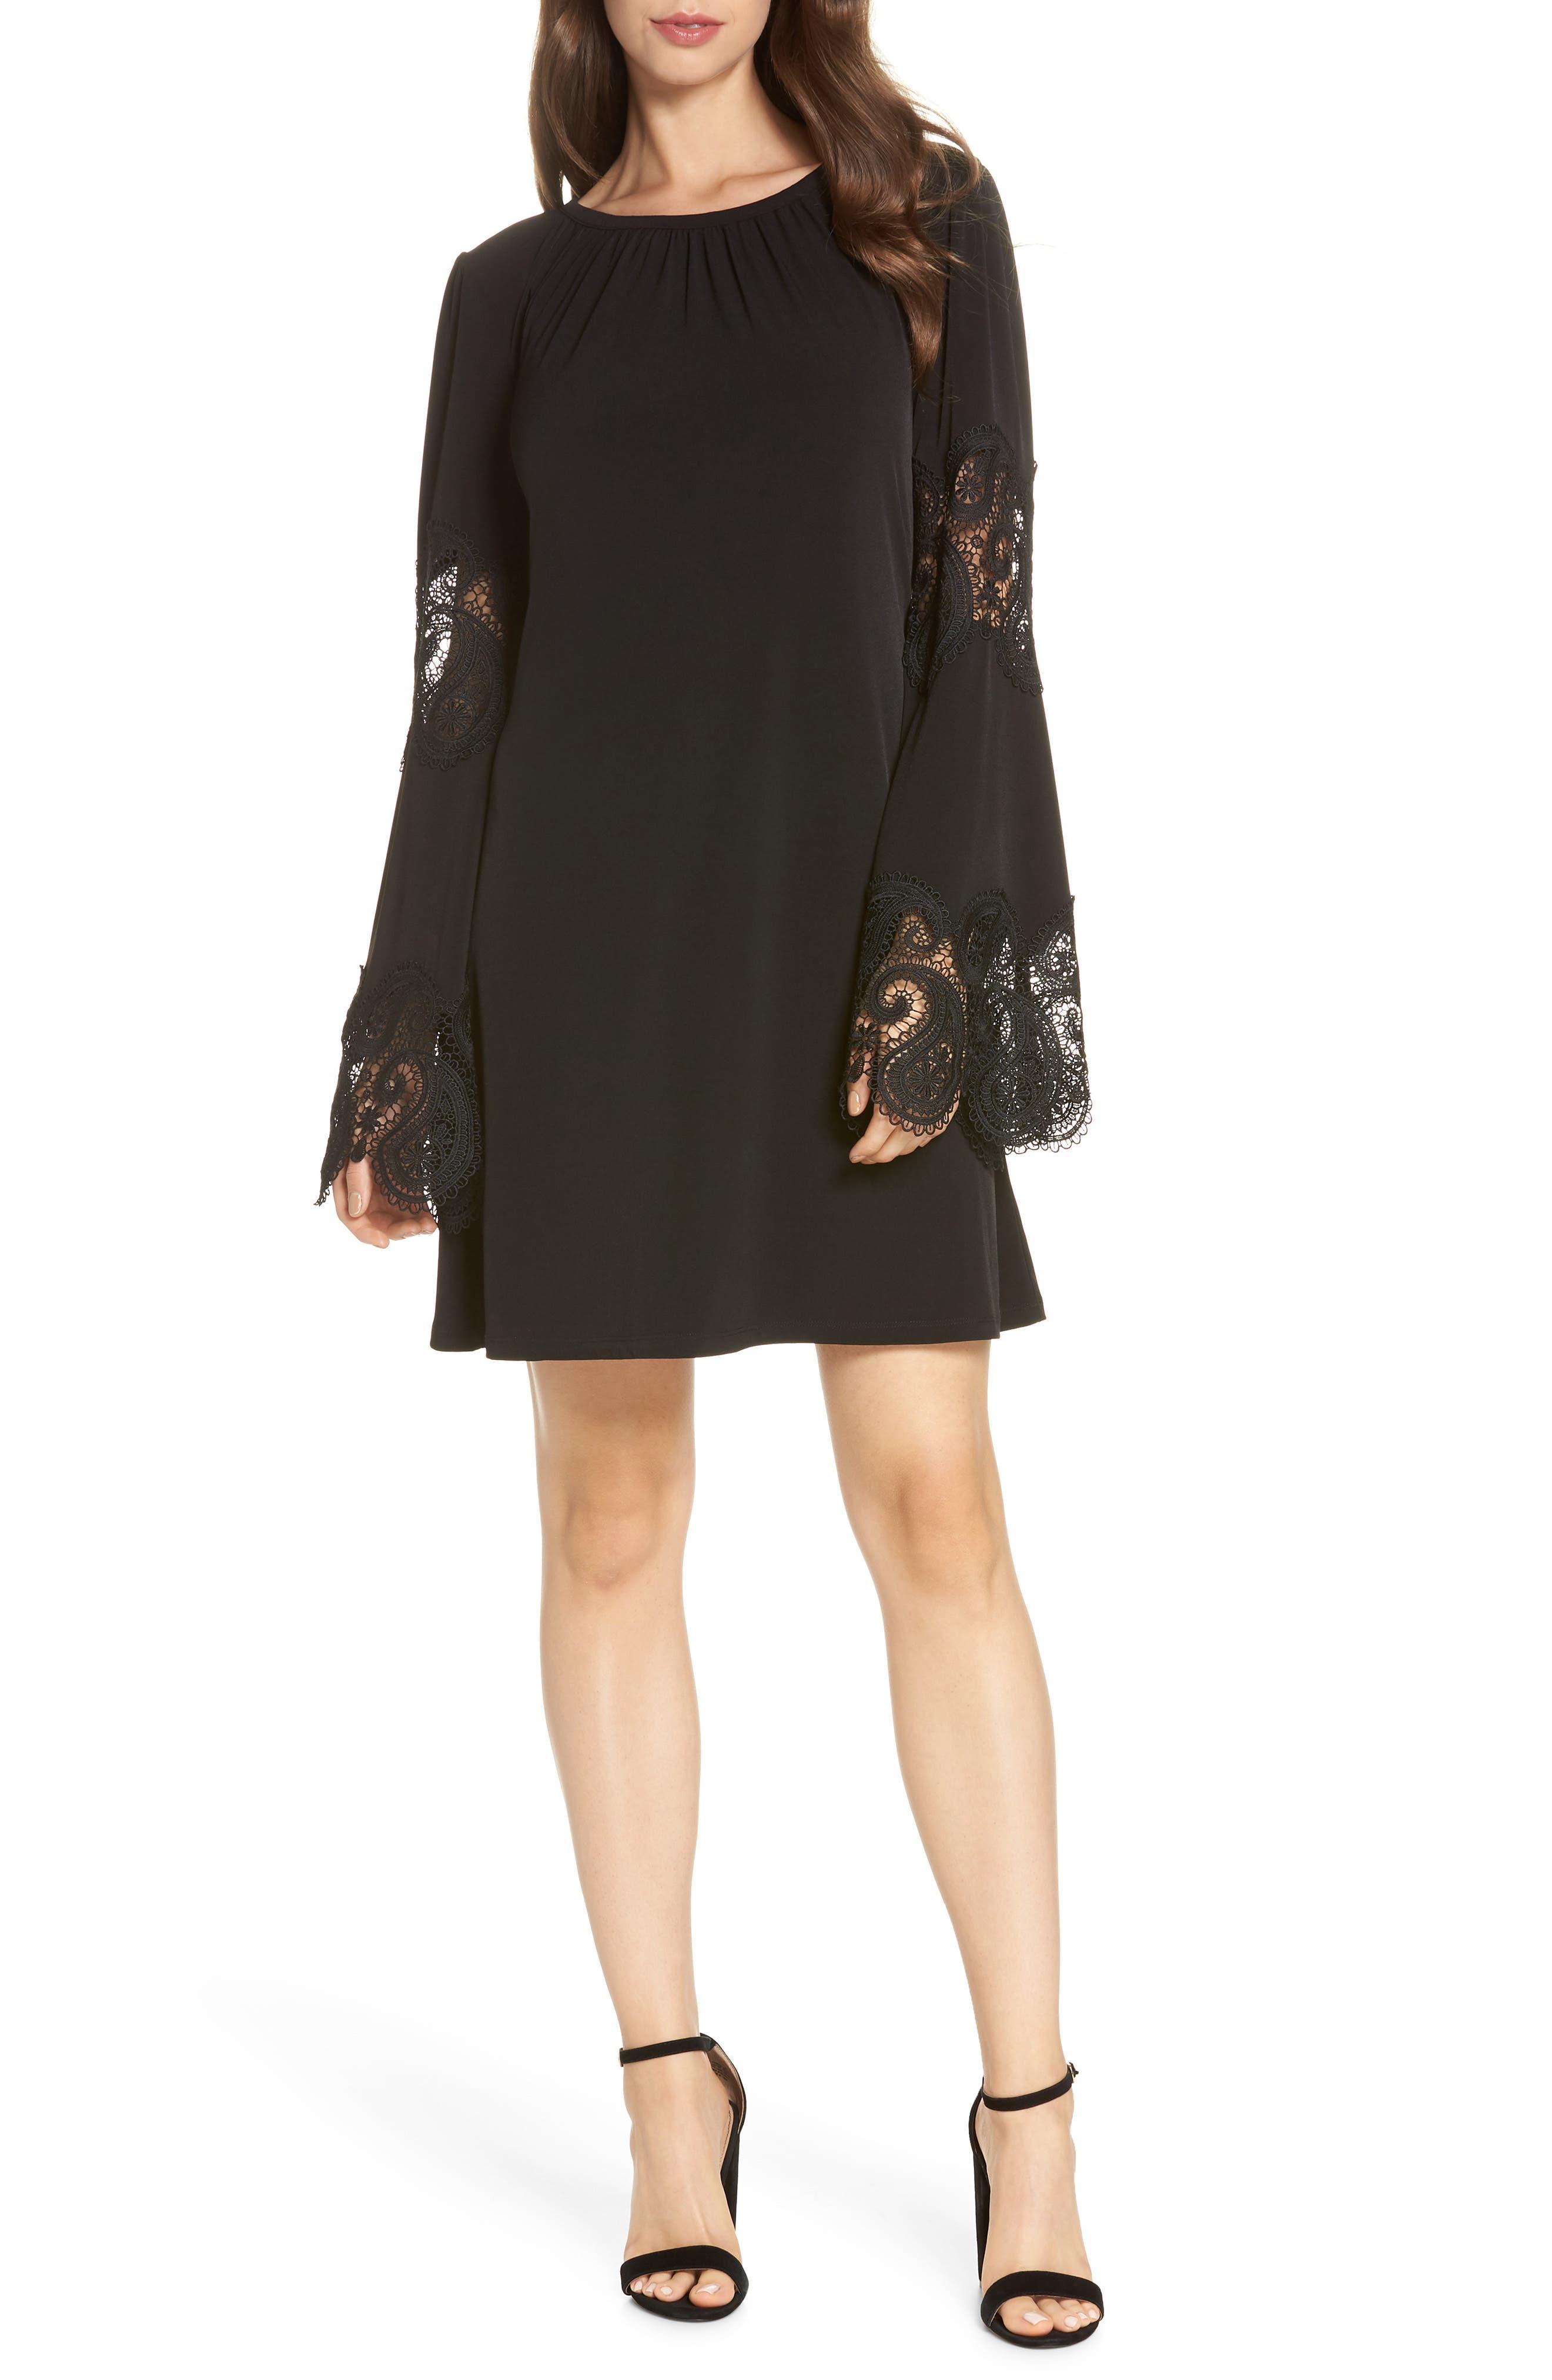 MICHAEL MICHAEL KORS Lace Inset Bell Sleeve Shift Dress, Main, color, 001